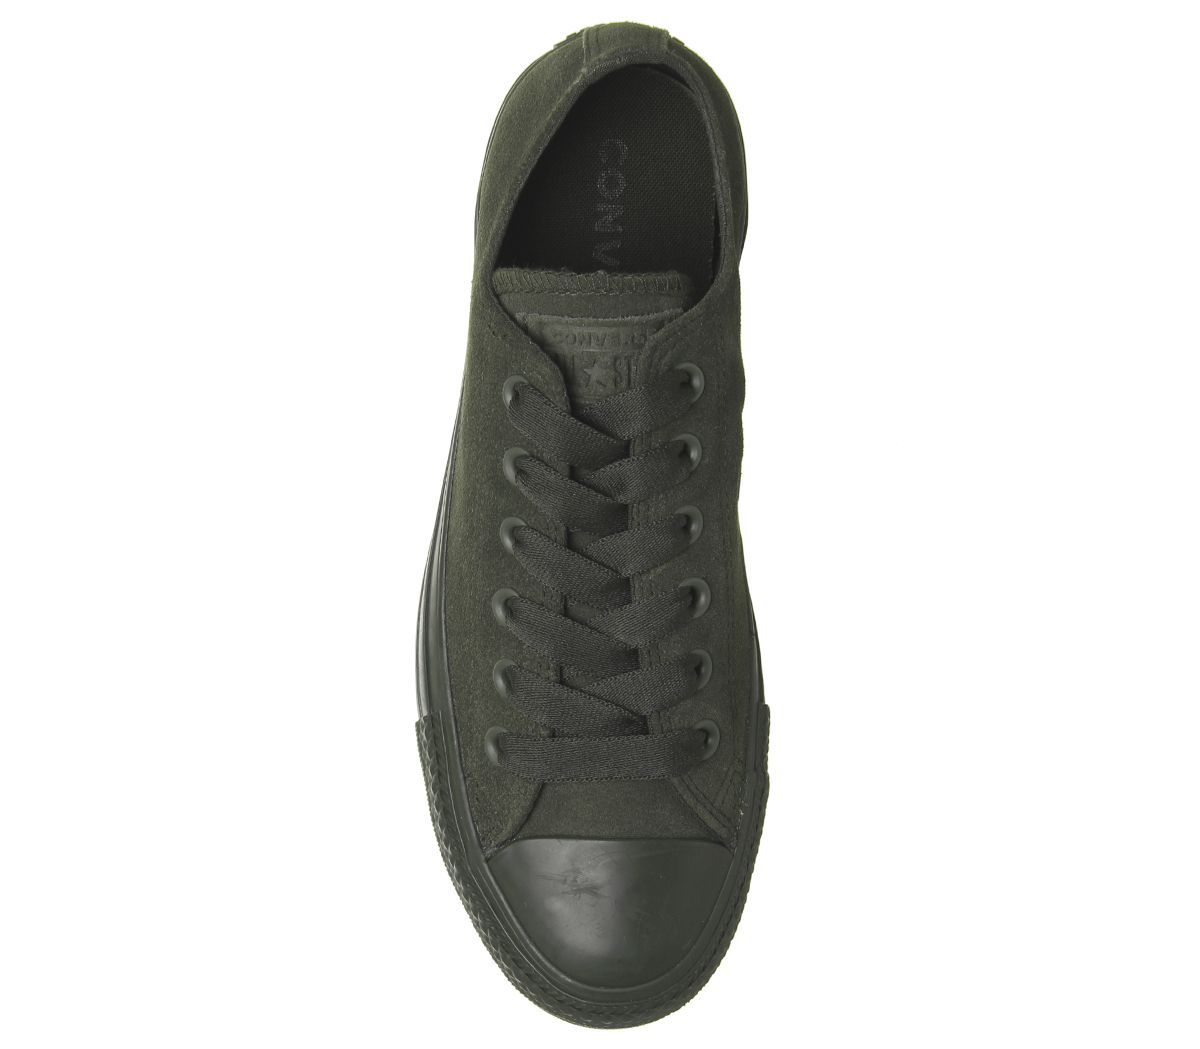 83851929cf937 SENTINELLE Womens Converse Converse All Star basse formateurs utilitaire  formateurs vert chaussures